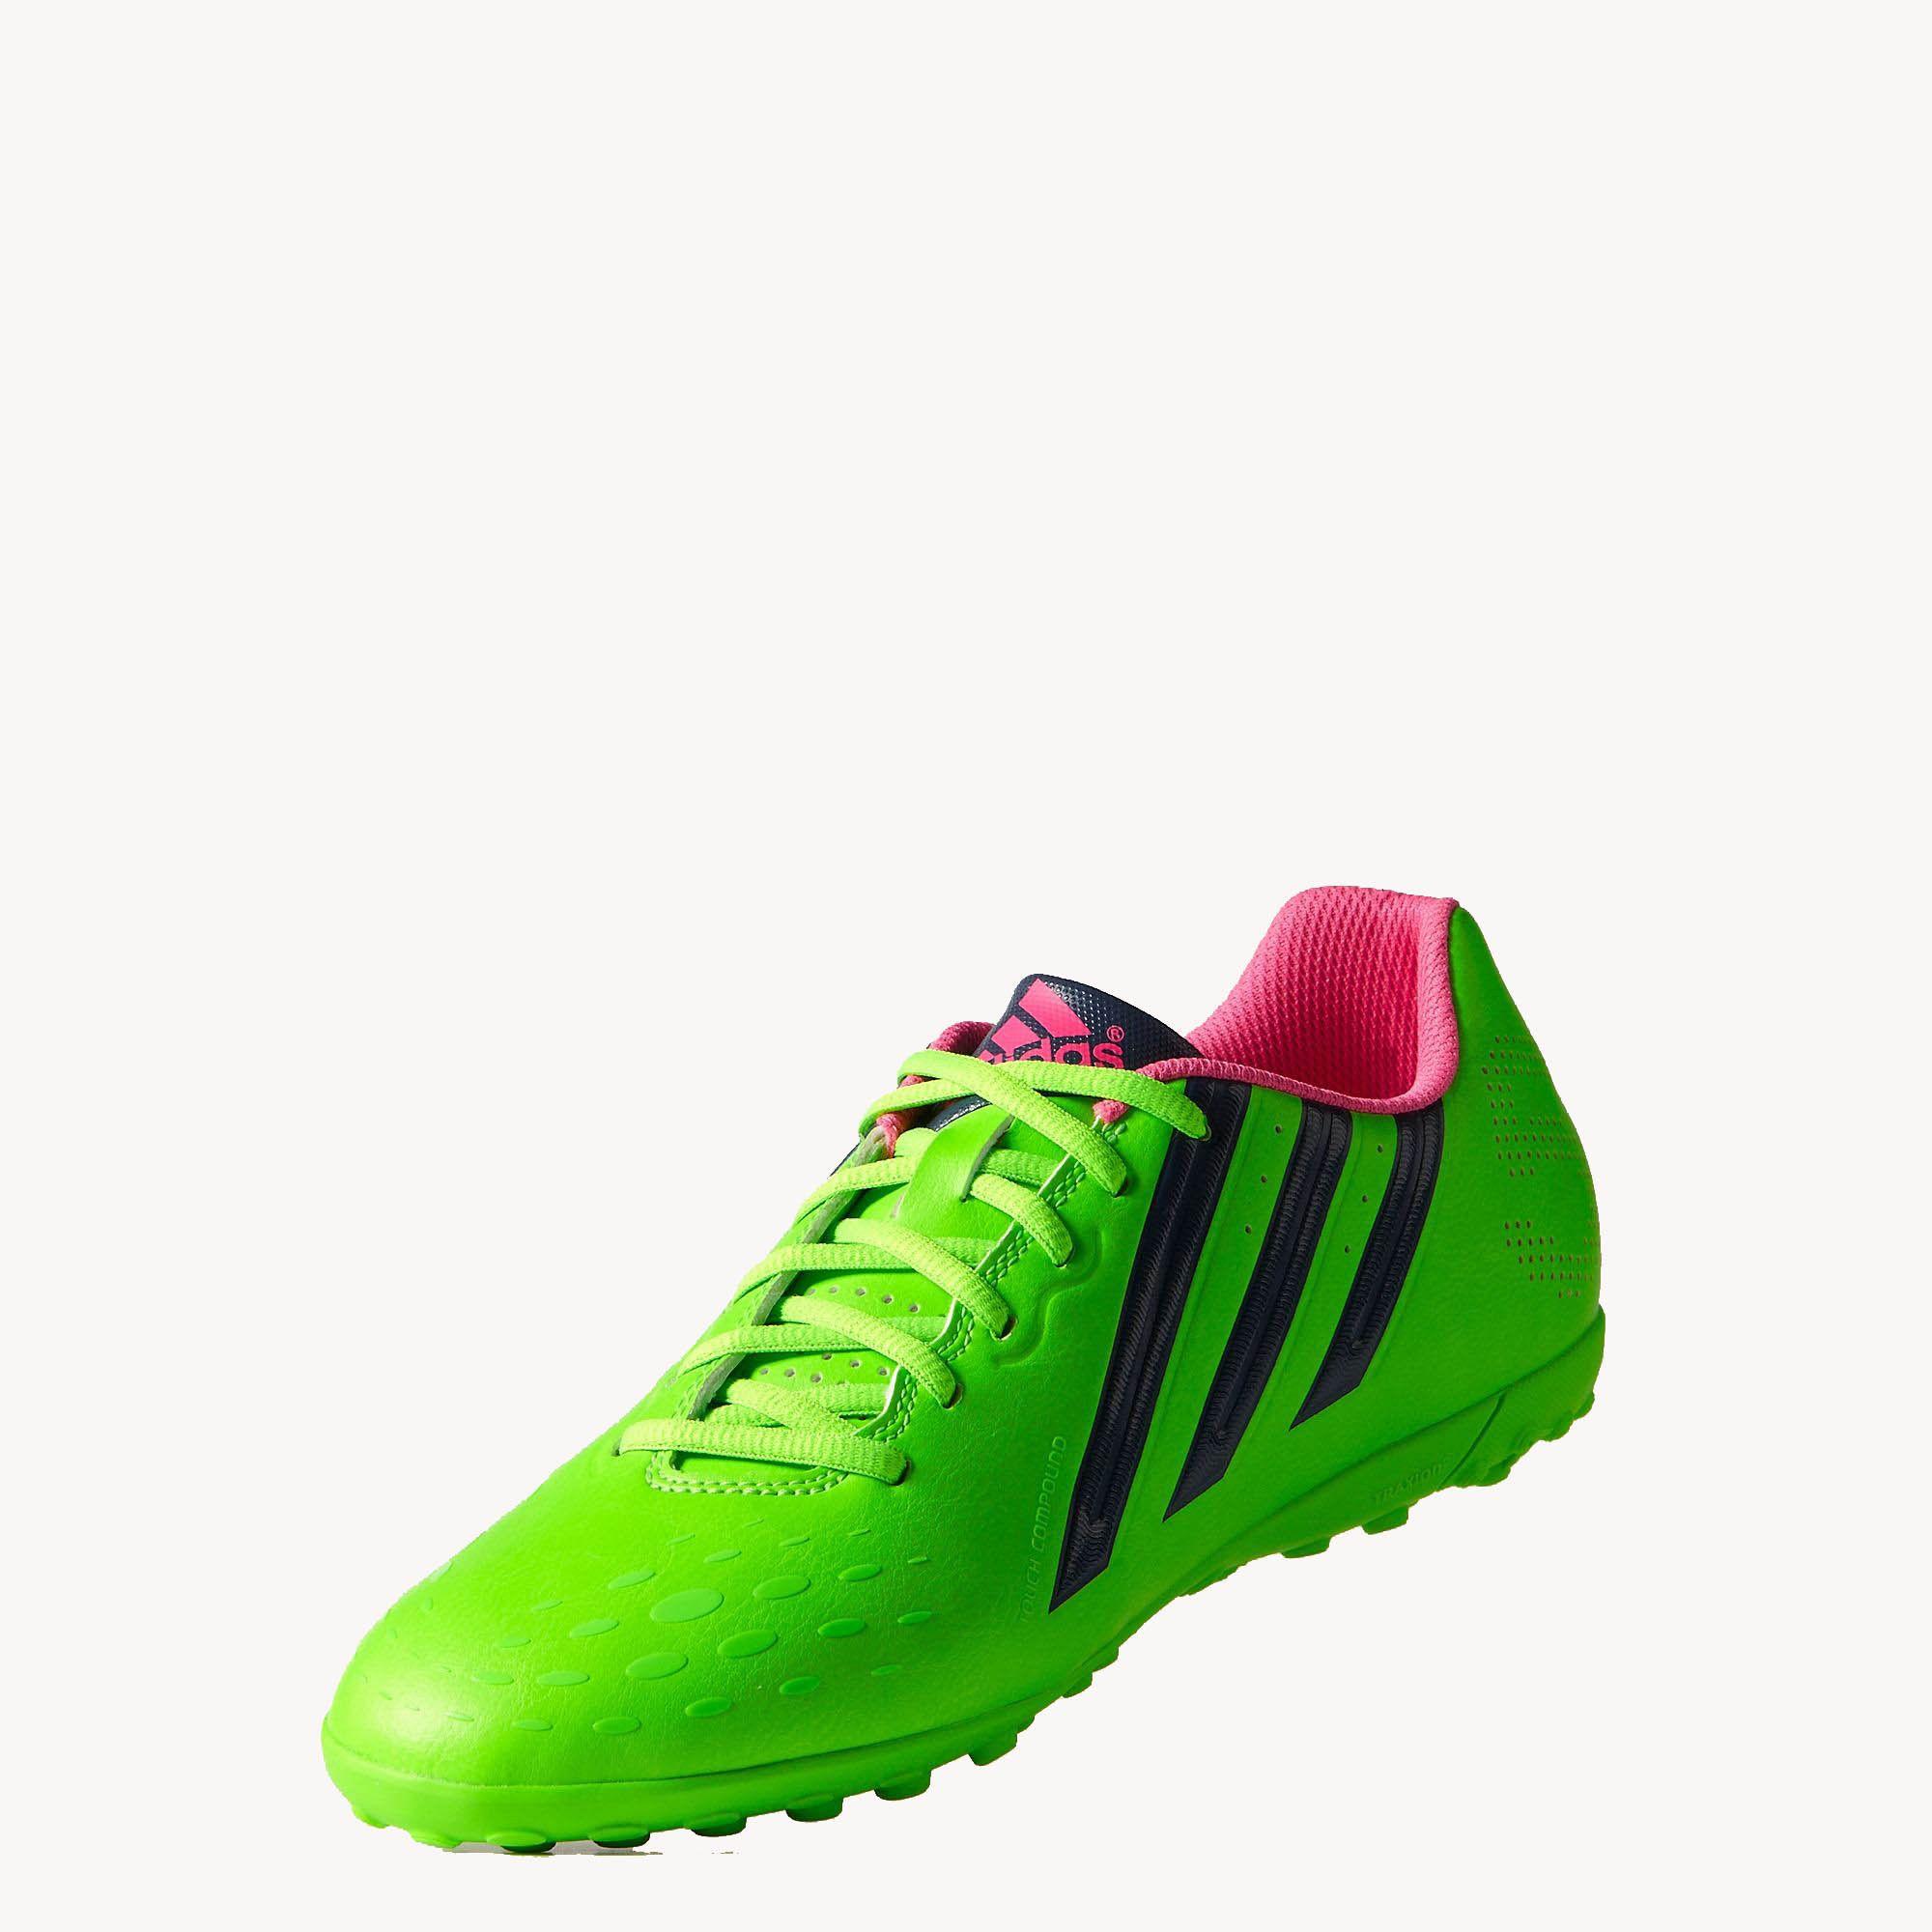 Adidas freefootball xite shoes tf shoes turf shoes